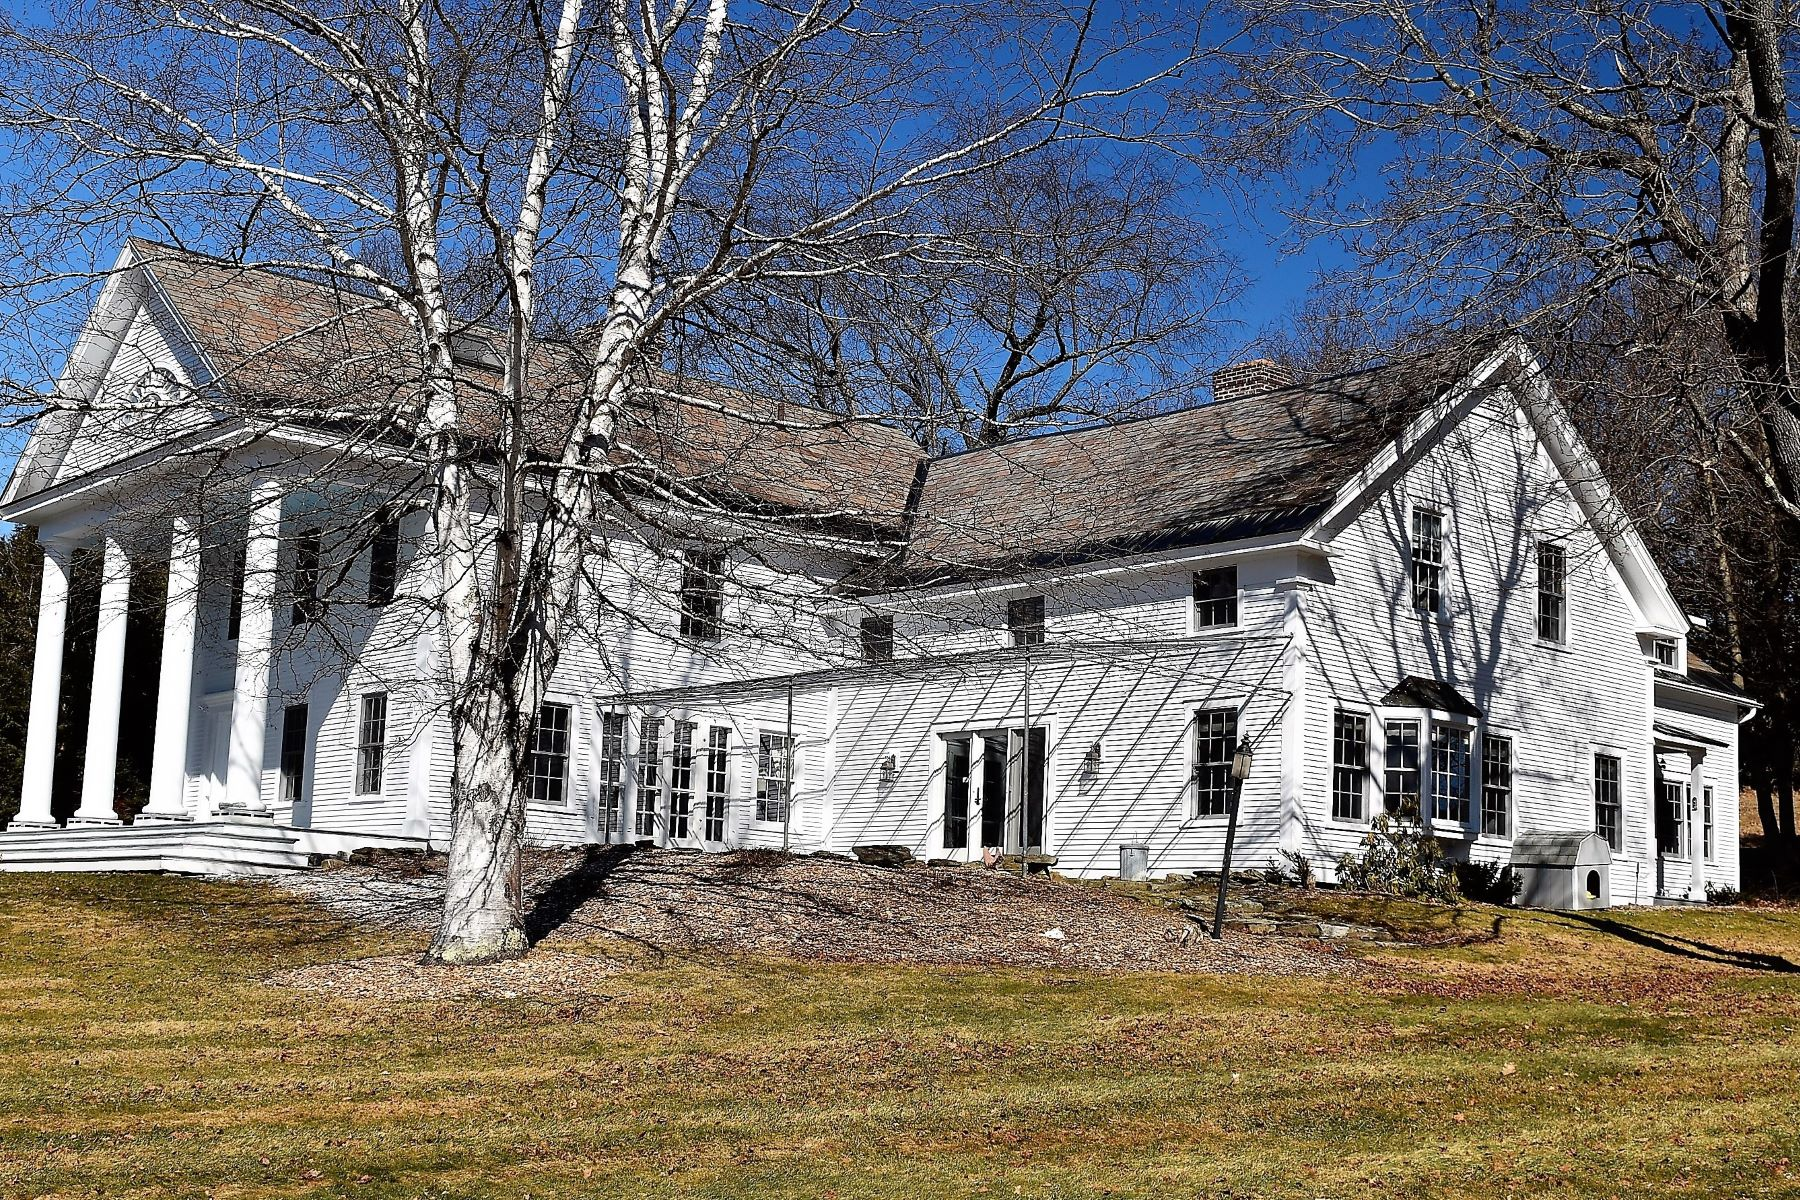 Single Family Home for Sale at 336 Tamarack Lane, Rutland Town 336 Tamarack Ln Rutland Town, Vermont, 05701 United States